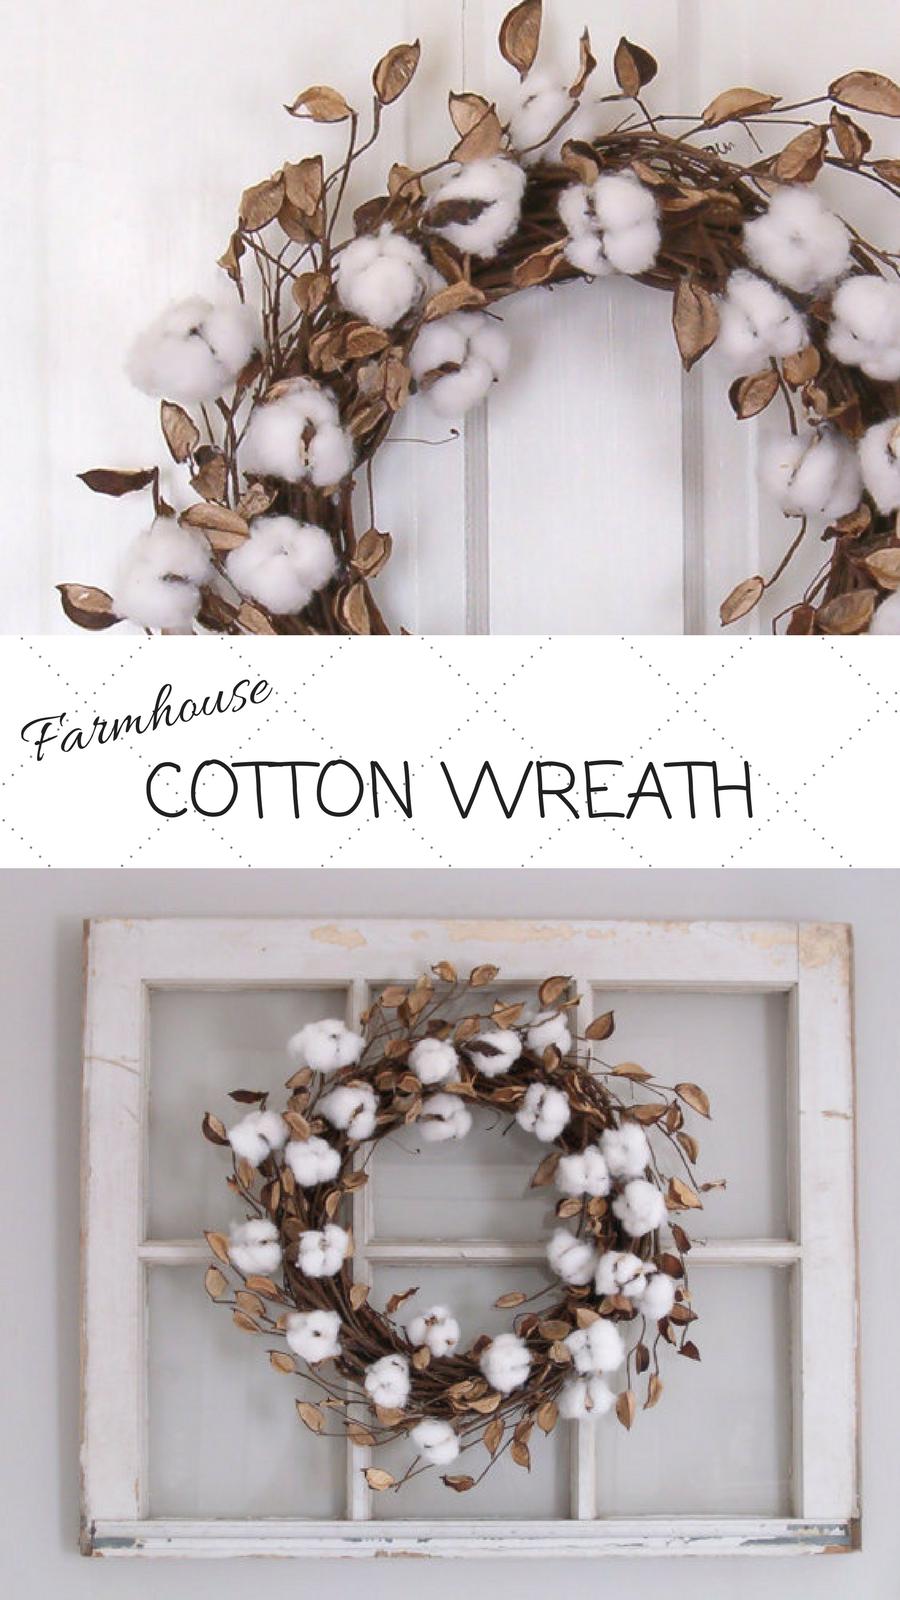 Cotton Wreath Cotton Ball Wreath Farmhouse Decor Farmhouse Wreath Front Door Wreath Wall Decor Afflink Old Door Decor Cotton Decor Cotton Wreath